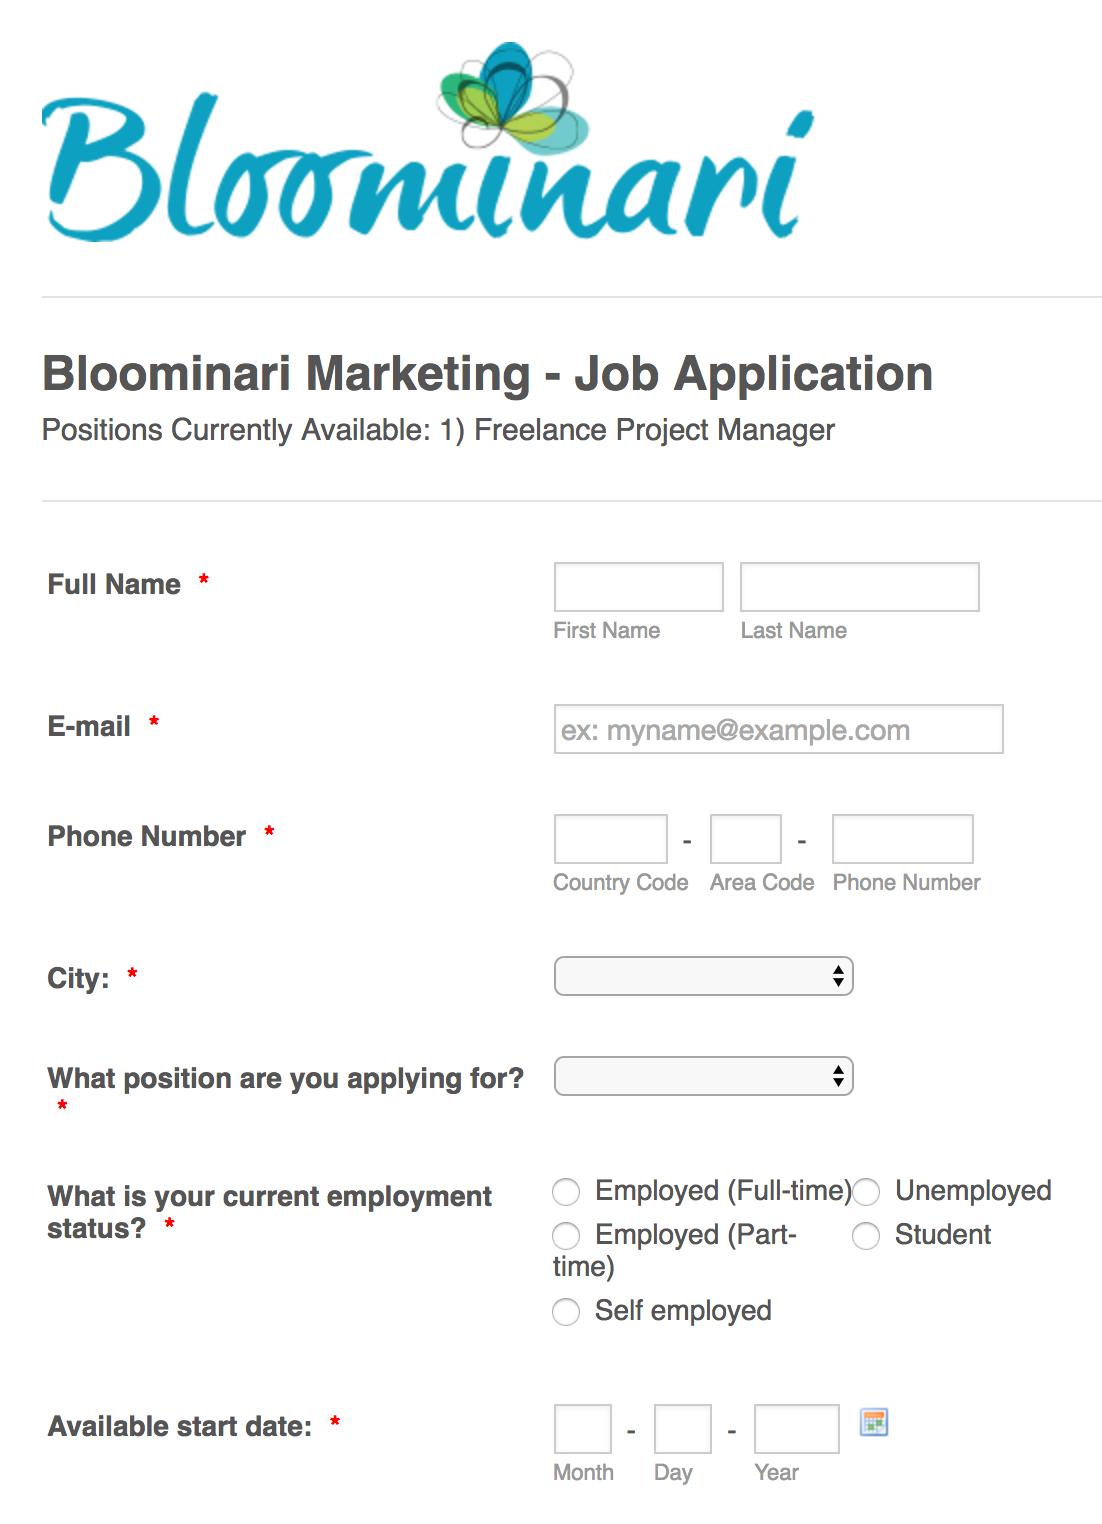 Apply To Bloominari